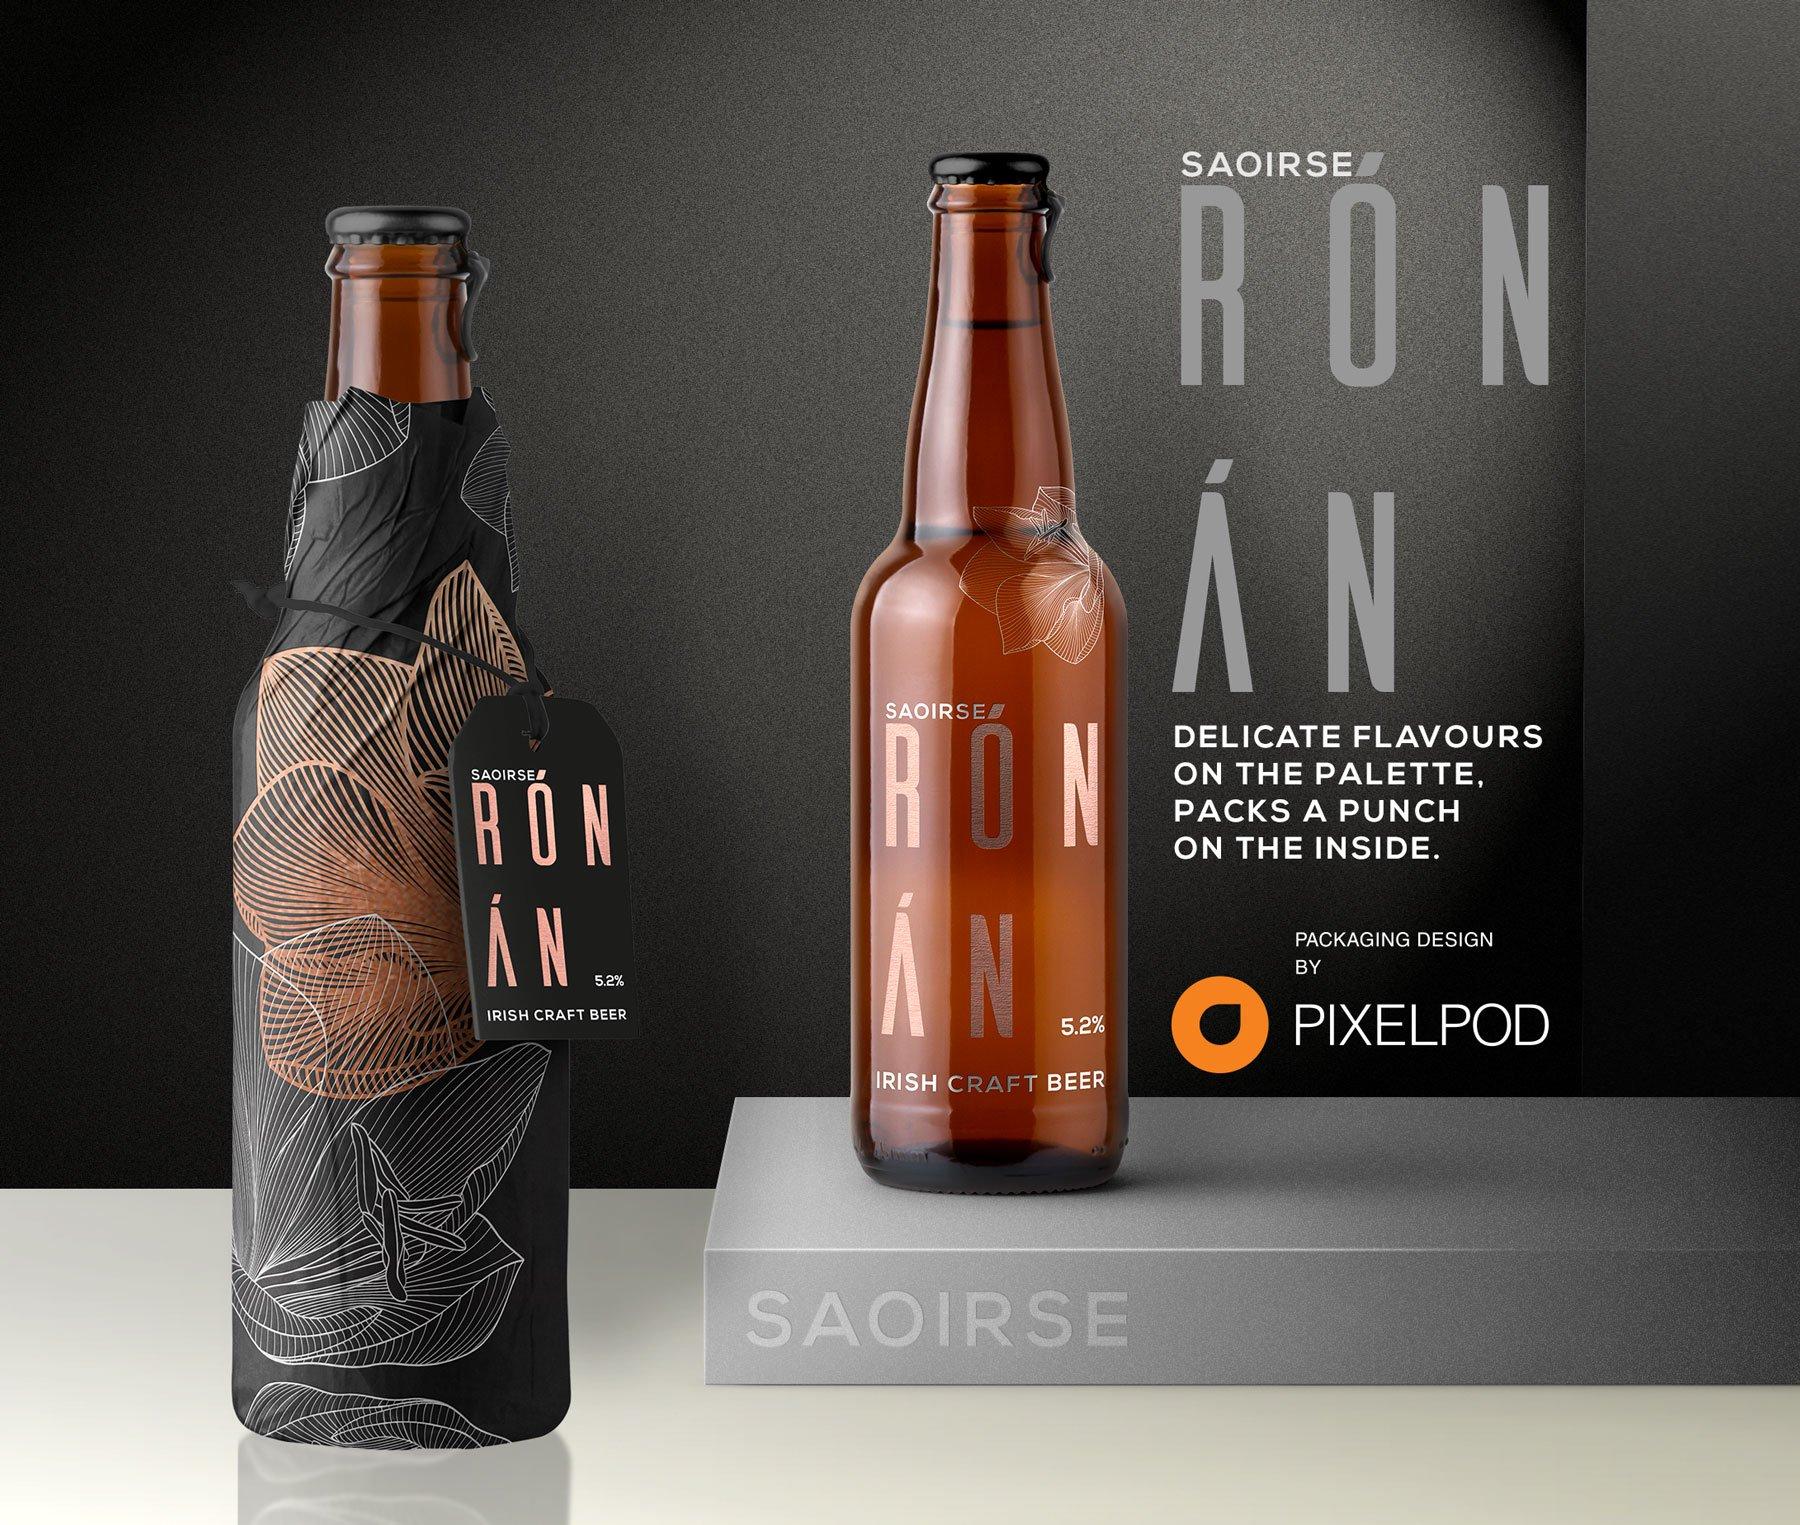 Saoise Ronan Irish craft beer, packaging design by pixelpod